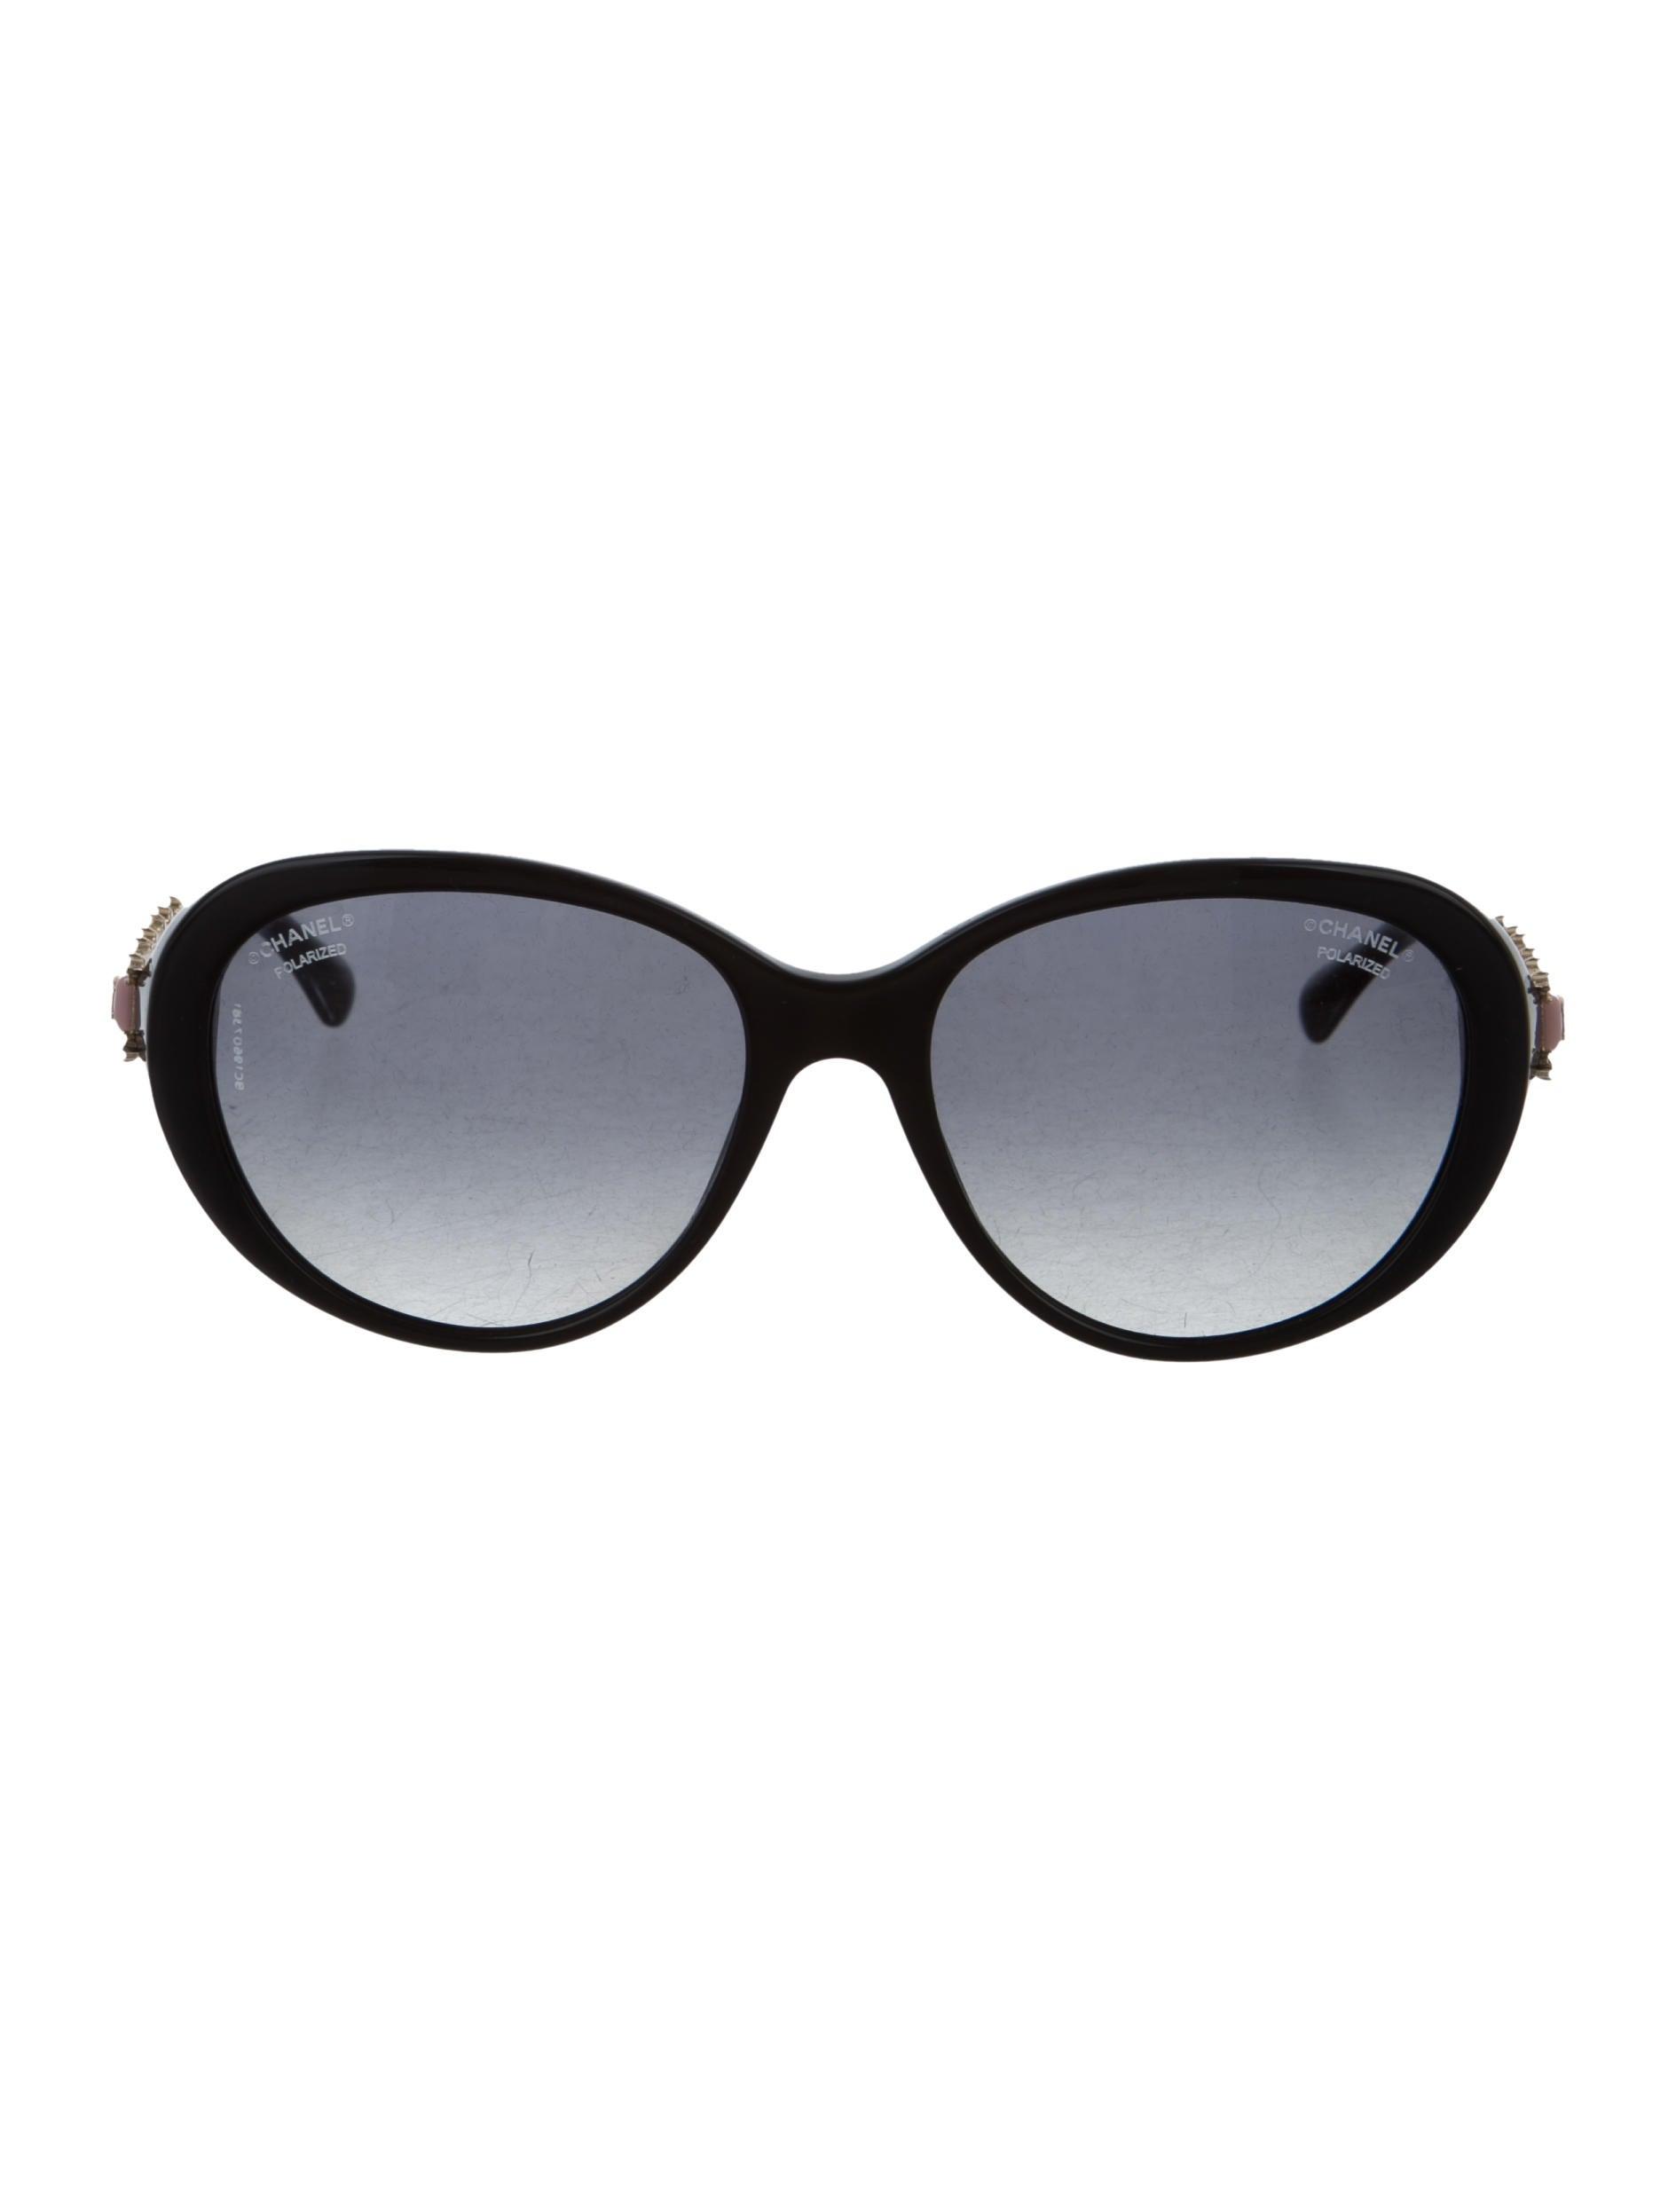 efe7f247b4 Chanel Polarized Pearl Bijoux Sunglasses w  Tags - Accessories ...